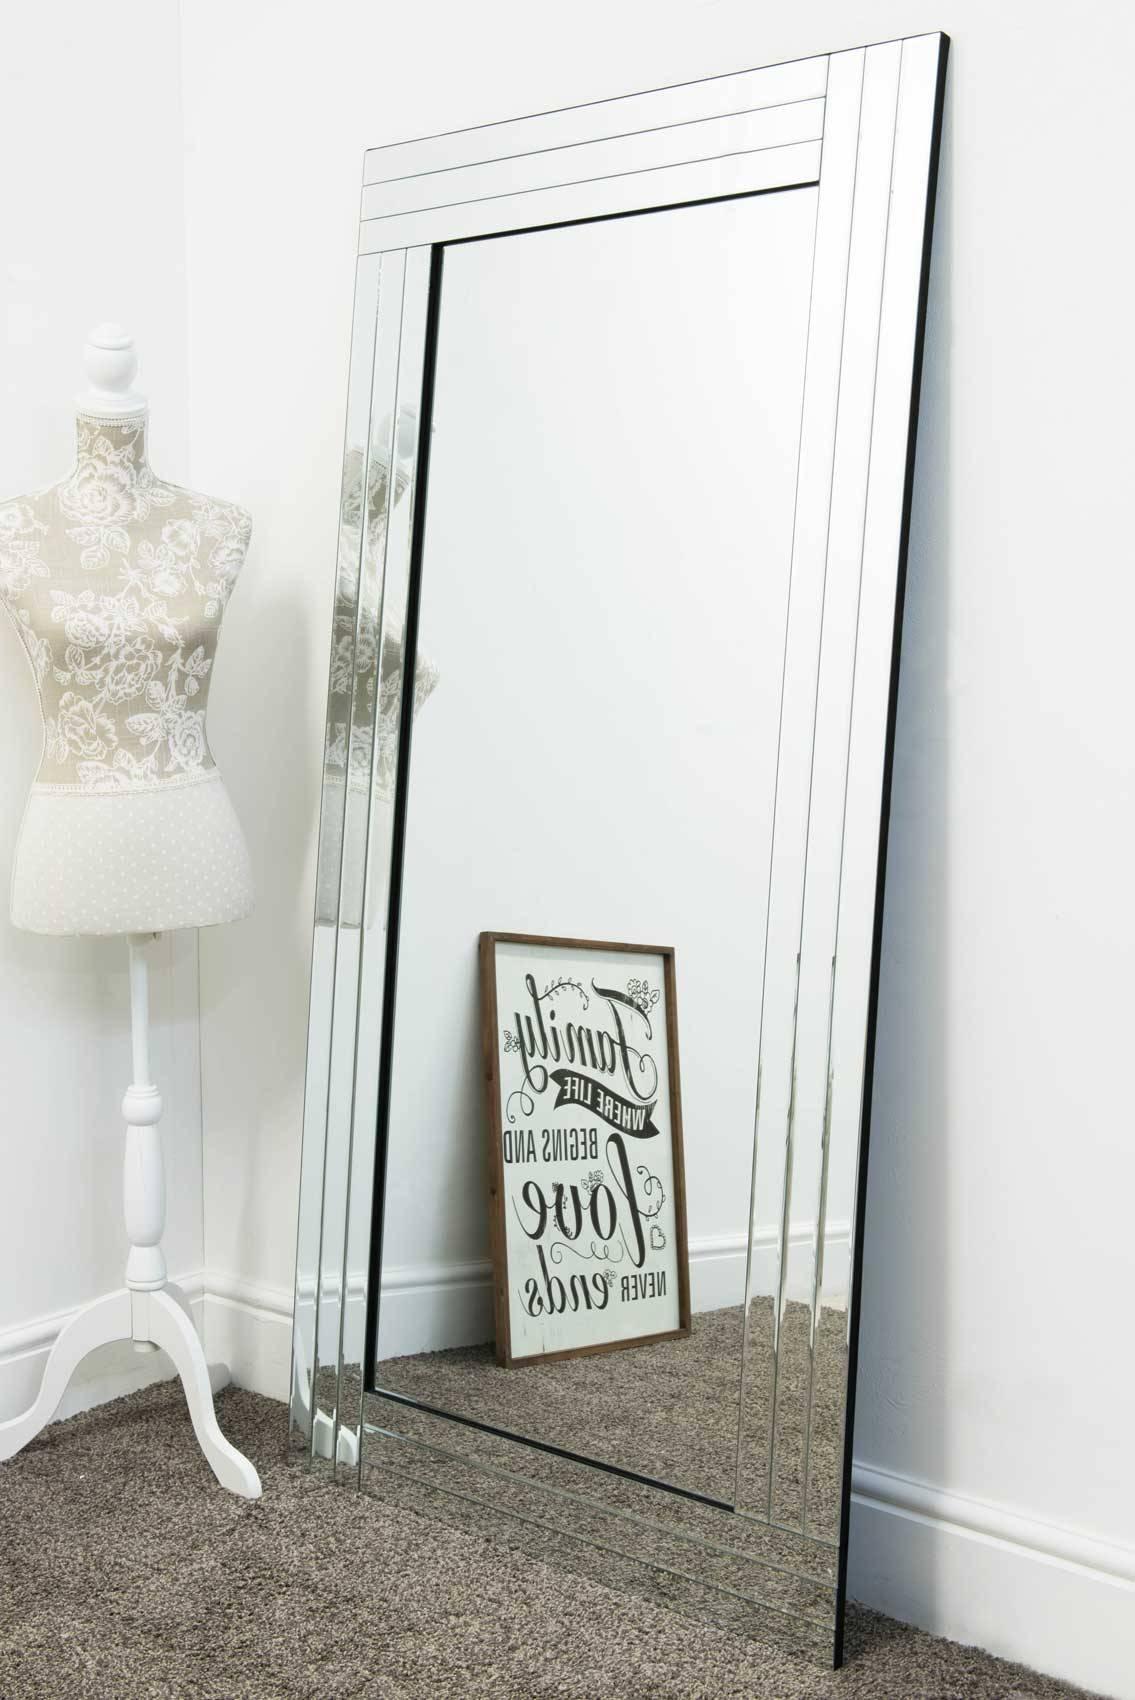 Lapford Full Length Venetian Mirror 174x85cm – Soraya Interiors Uk With Regard To Venetian Full Length Mirrors (View 12 of 15)